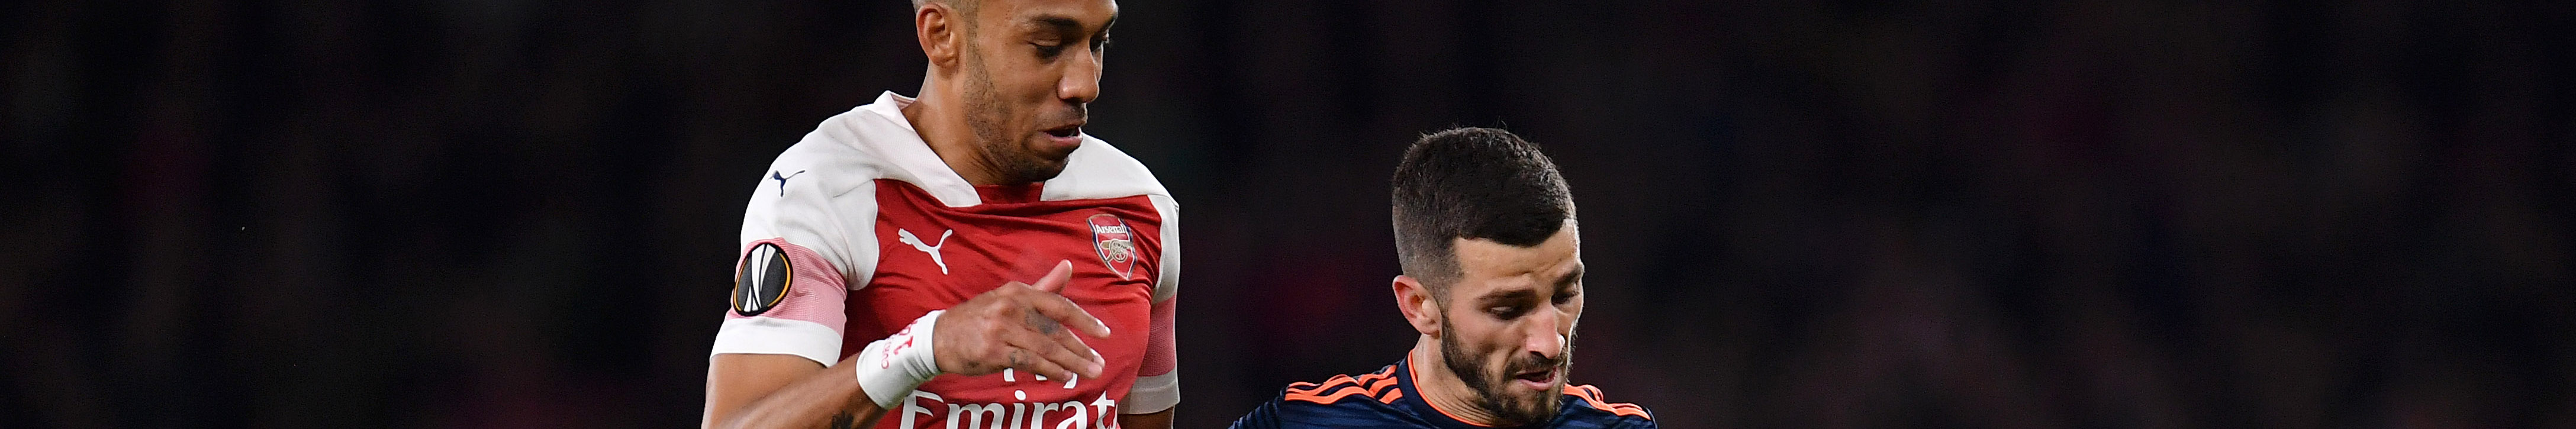 FC Valencia - FC Arsenal: Gunners vor dem letzten Schritt ins Finale